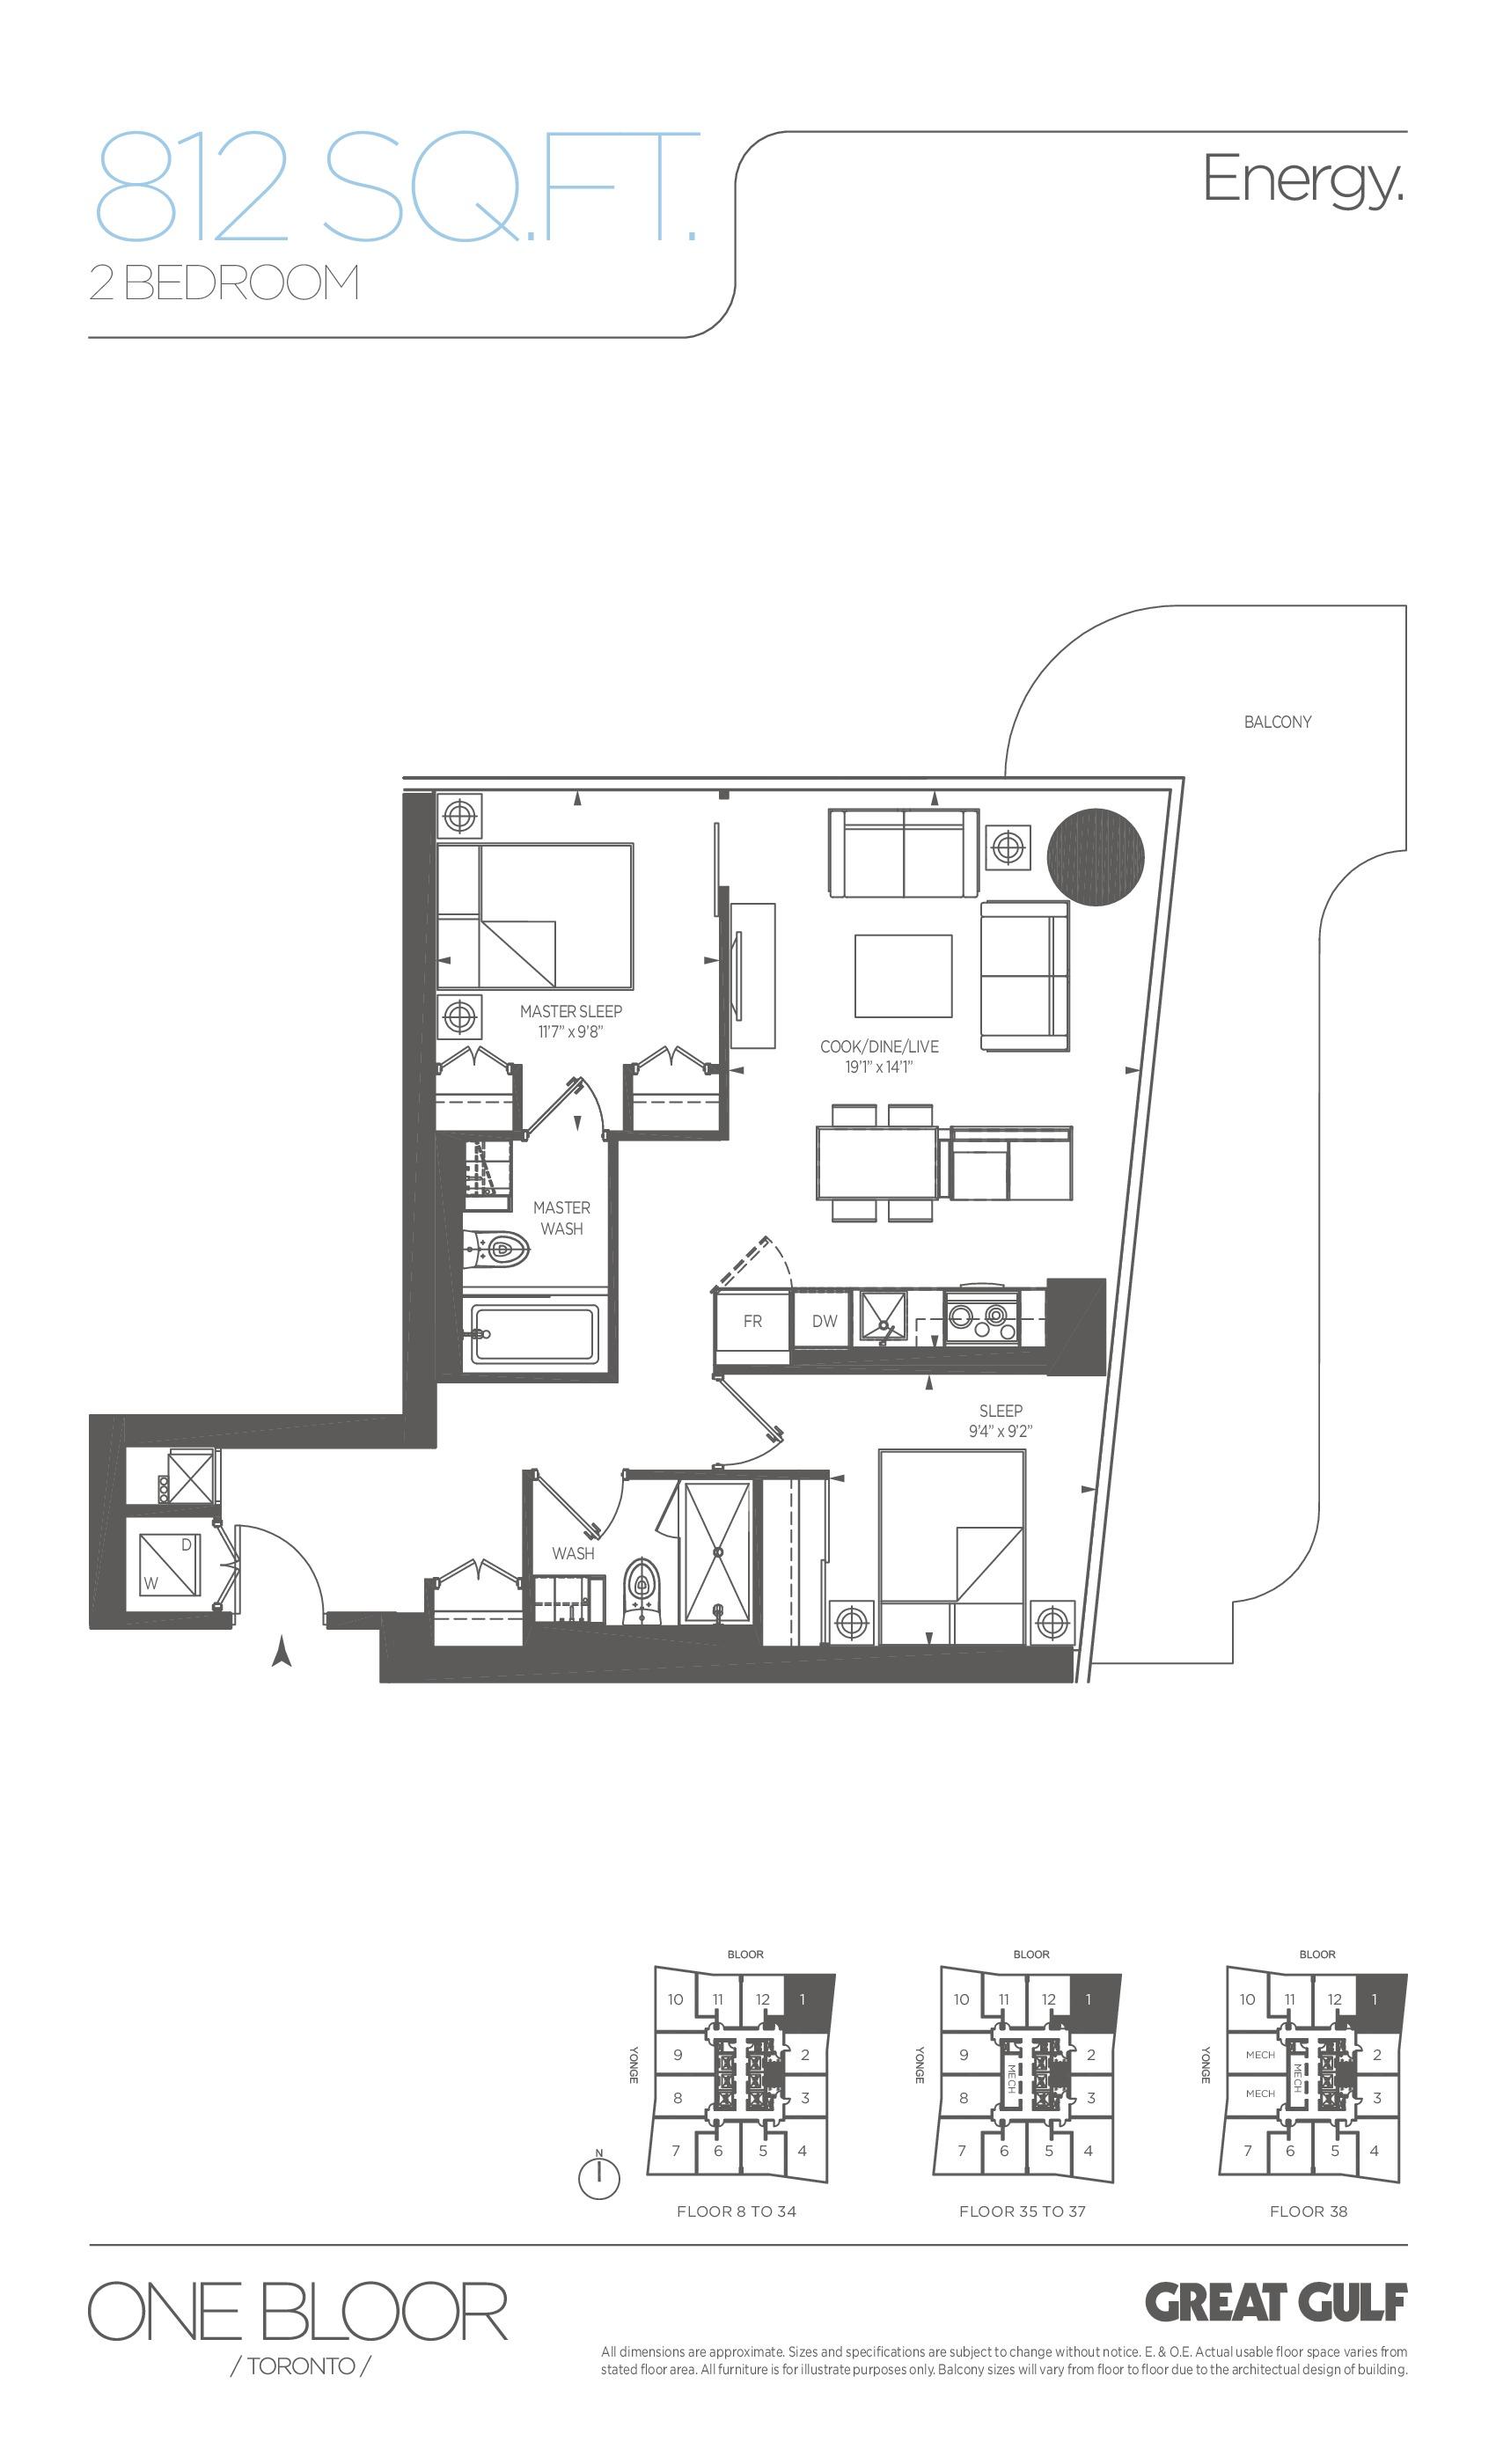 Energy Floor Plan at One Bloor Condos - 812 sq.ft